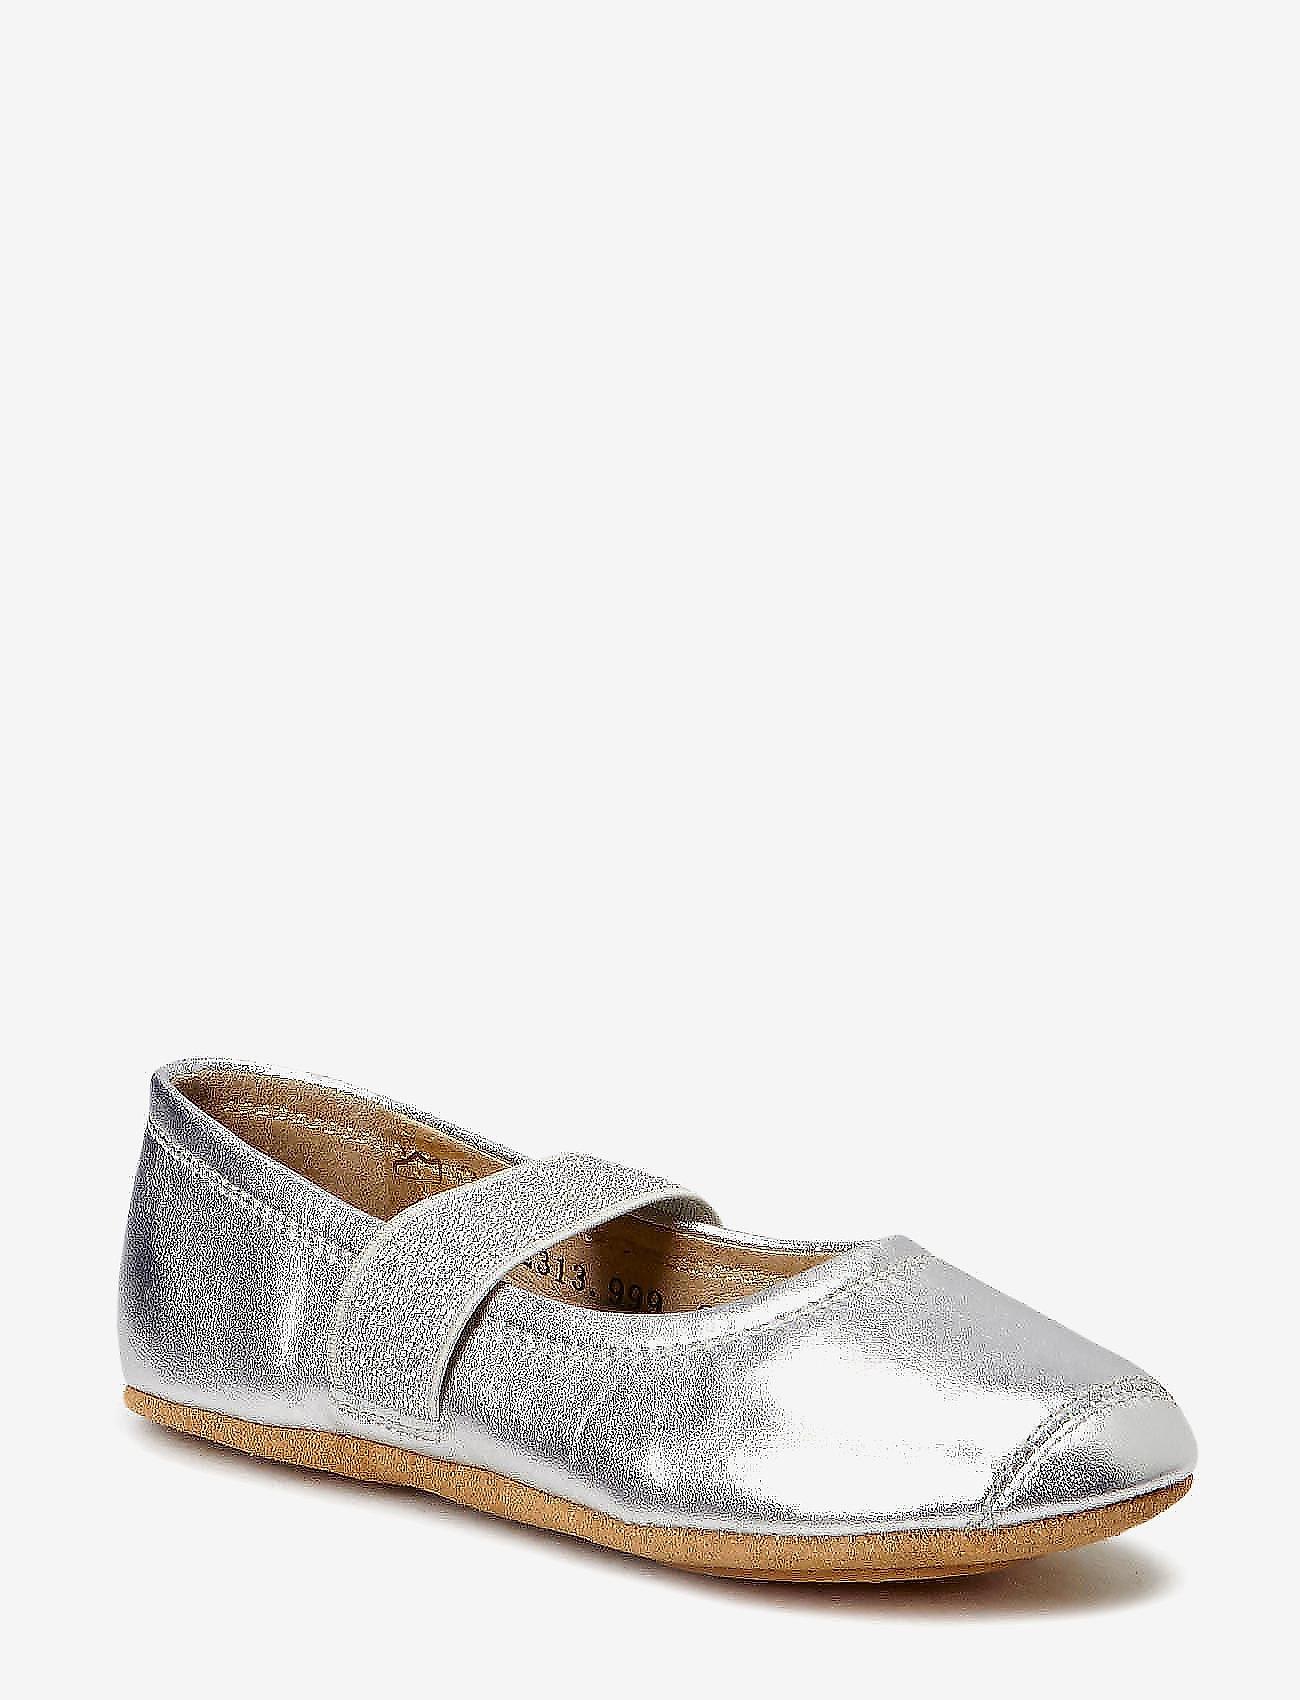 Bisgaard - SLIPPERS BALLET - sko - 01 silver - 0